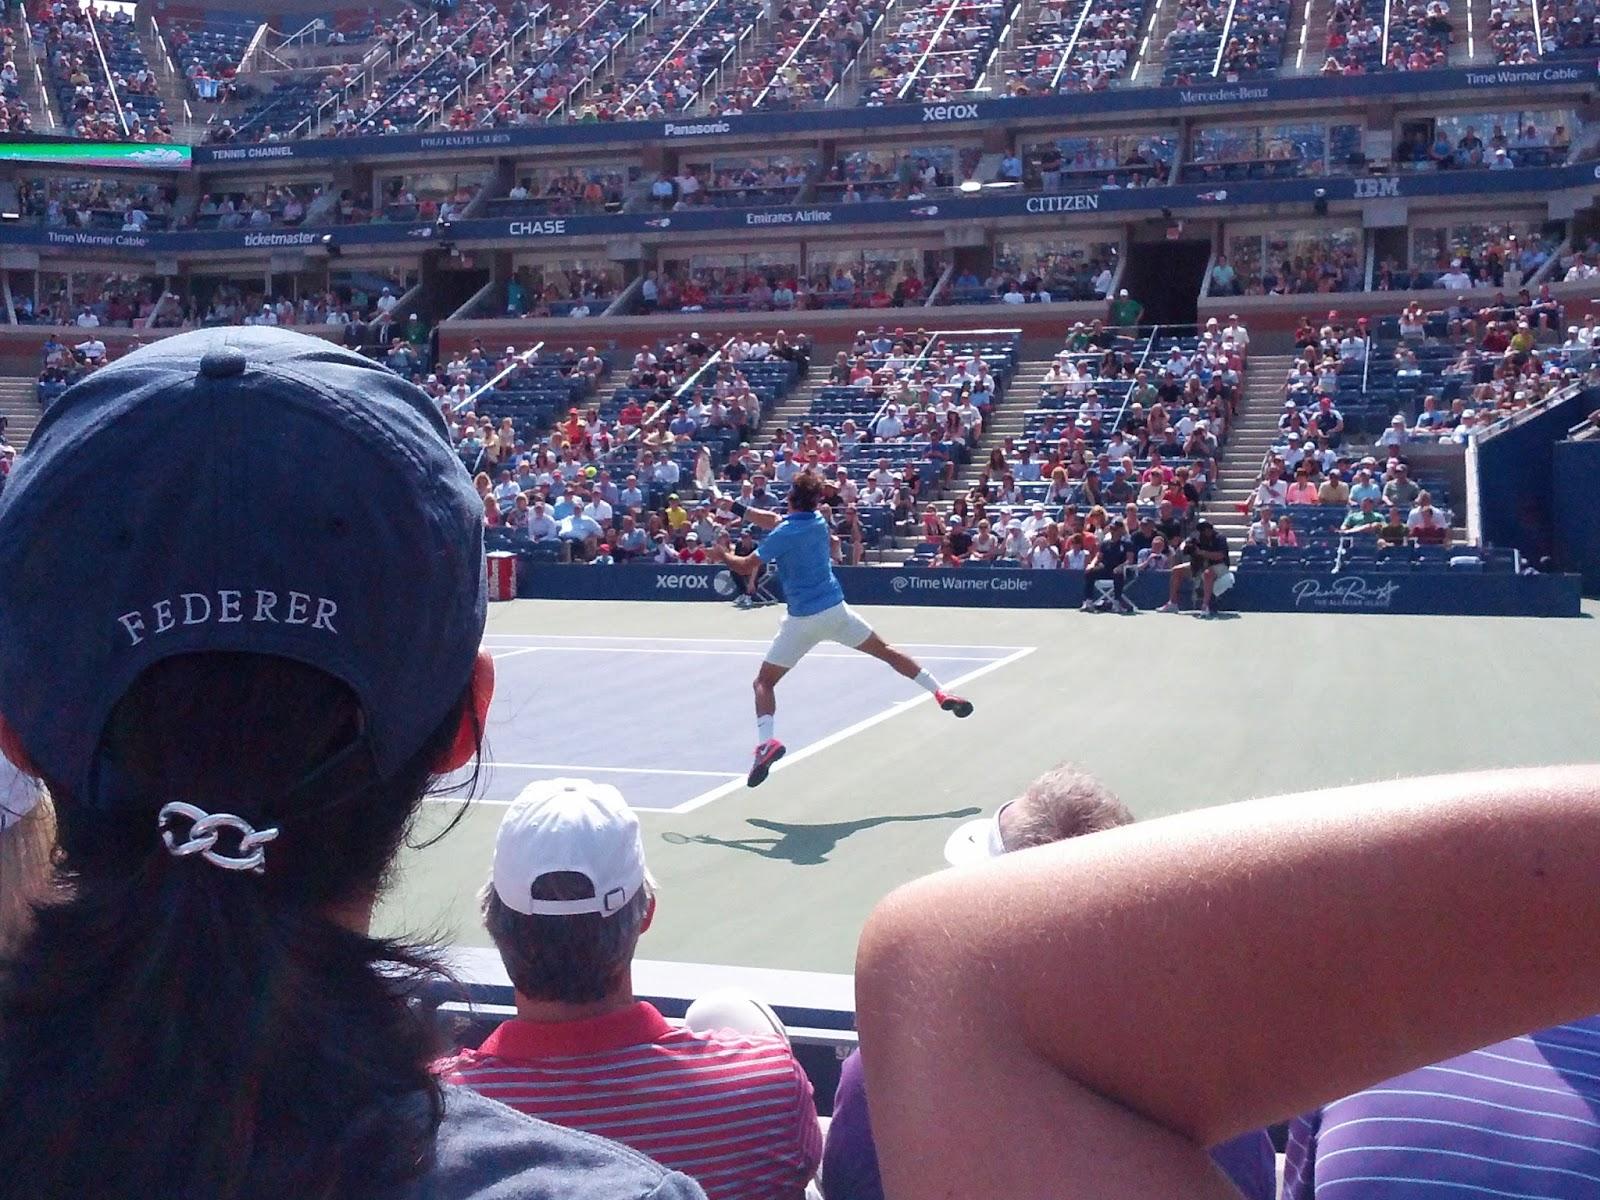 Roger Federer at the US Tennis Open